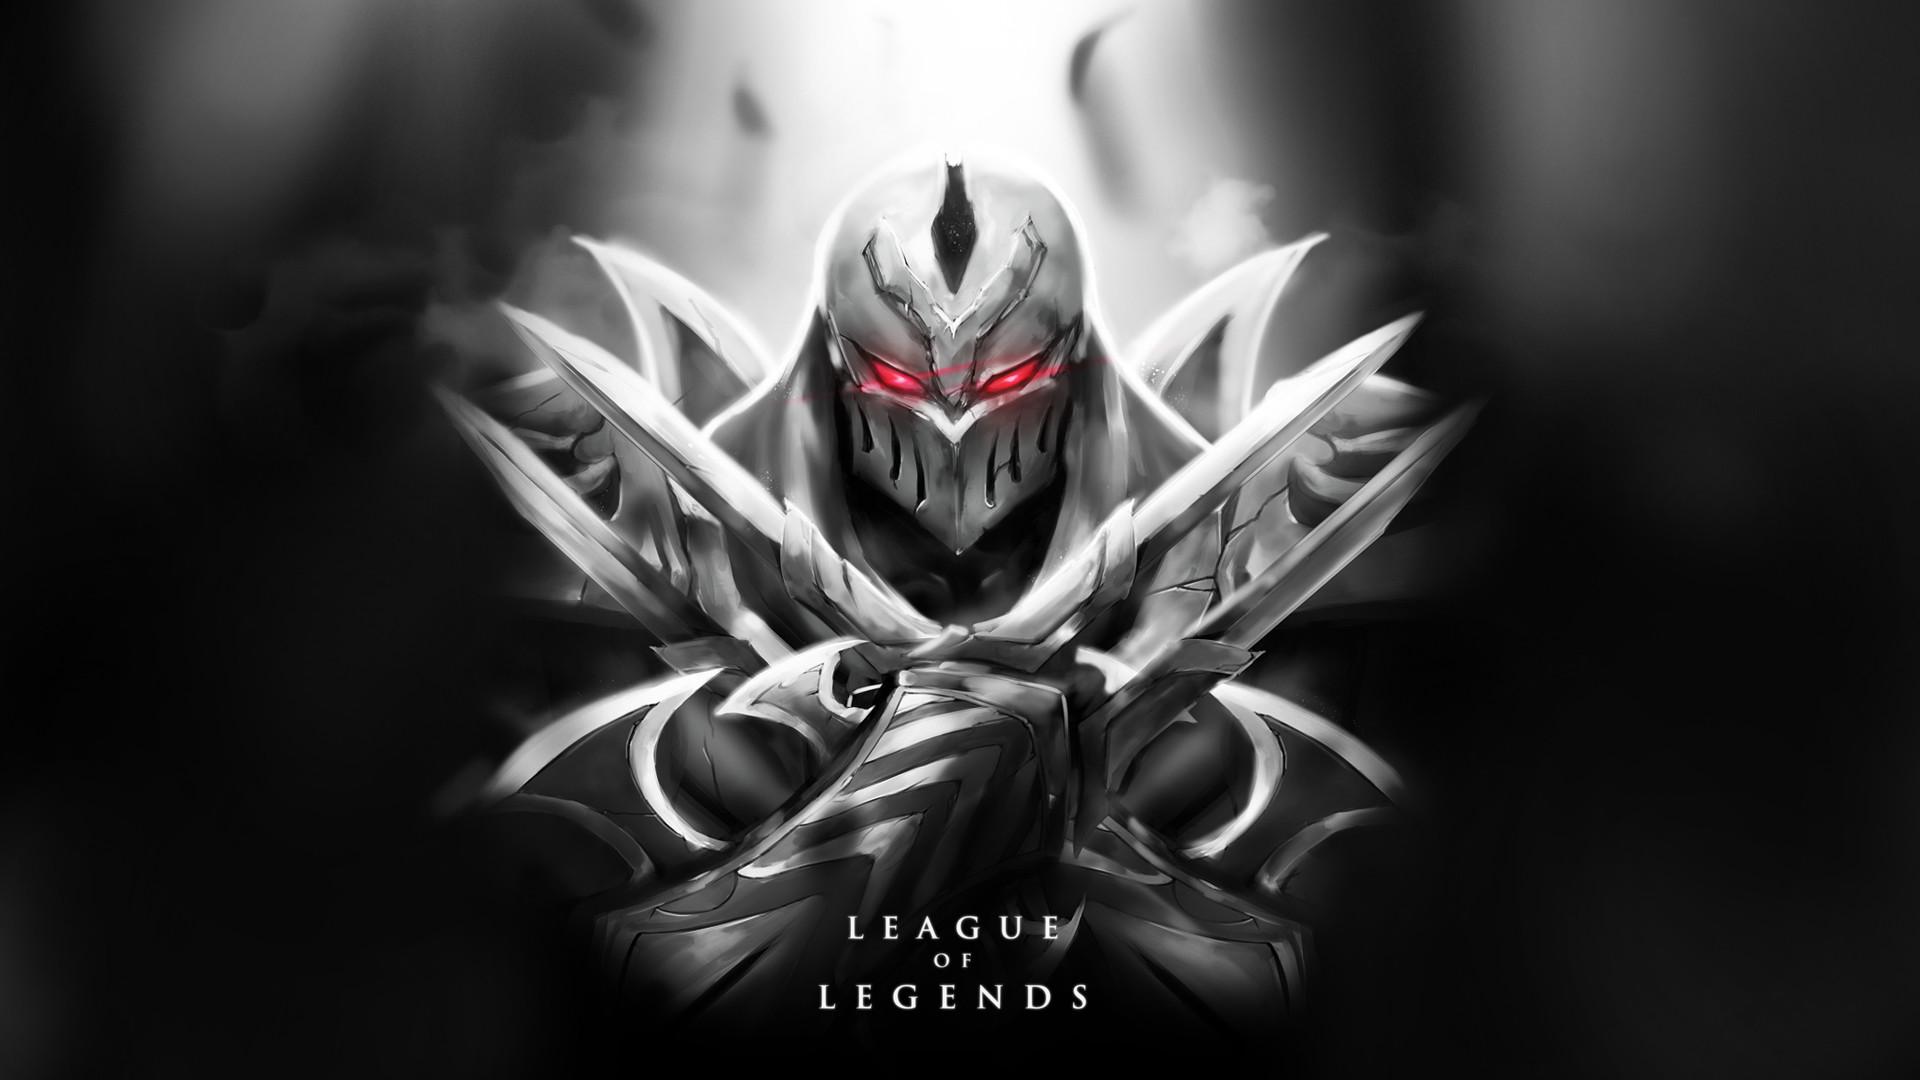 47 League Of Legends Zed Wallpaper On Wallpapersafari